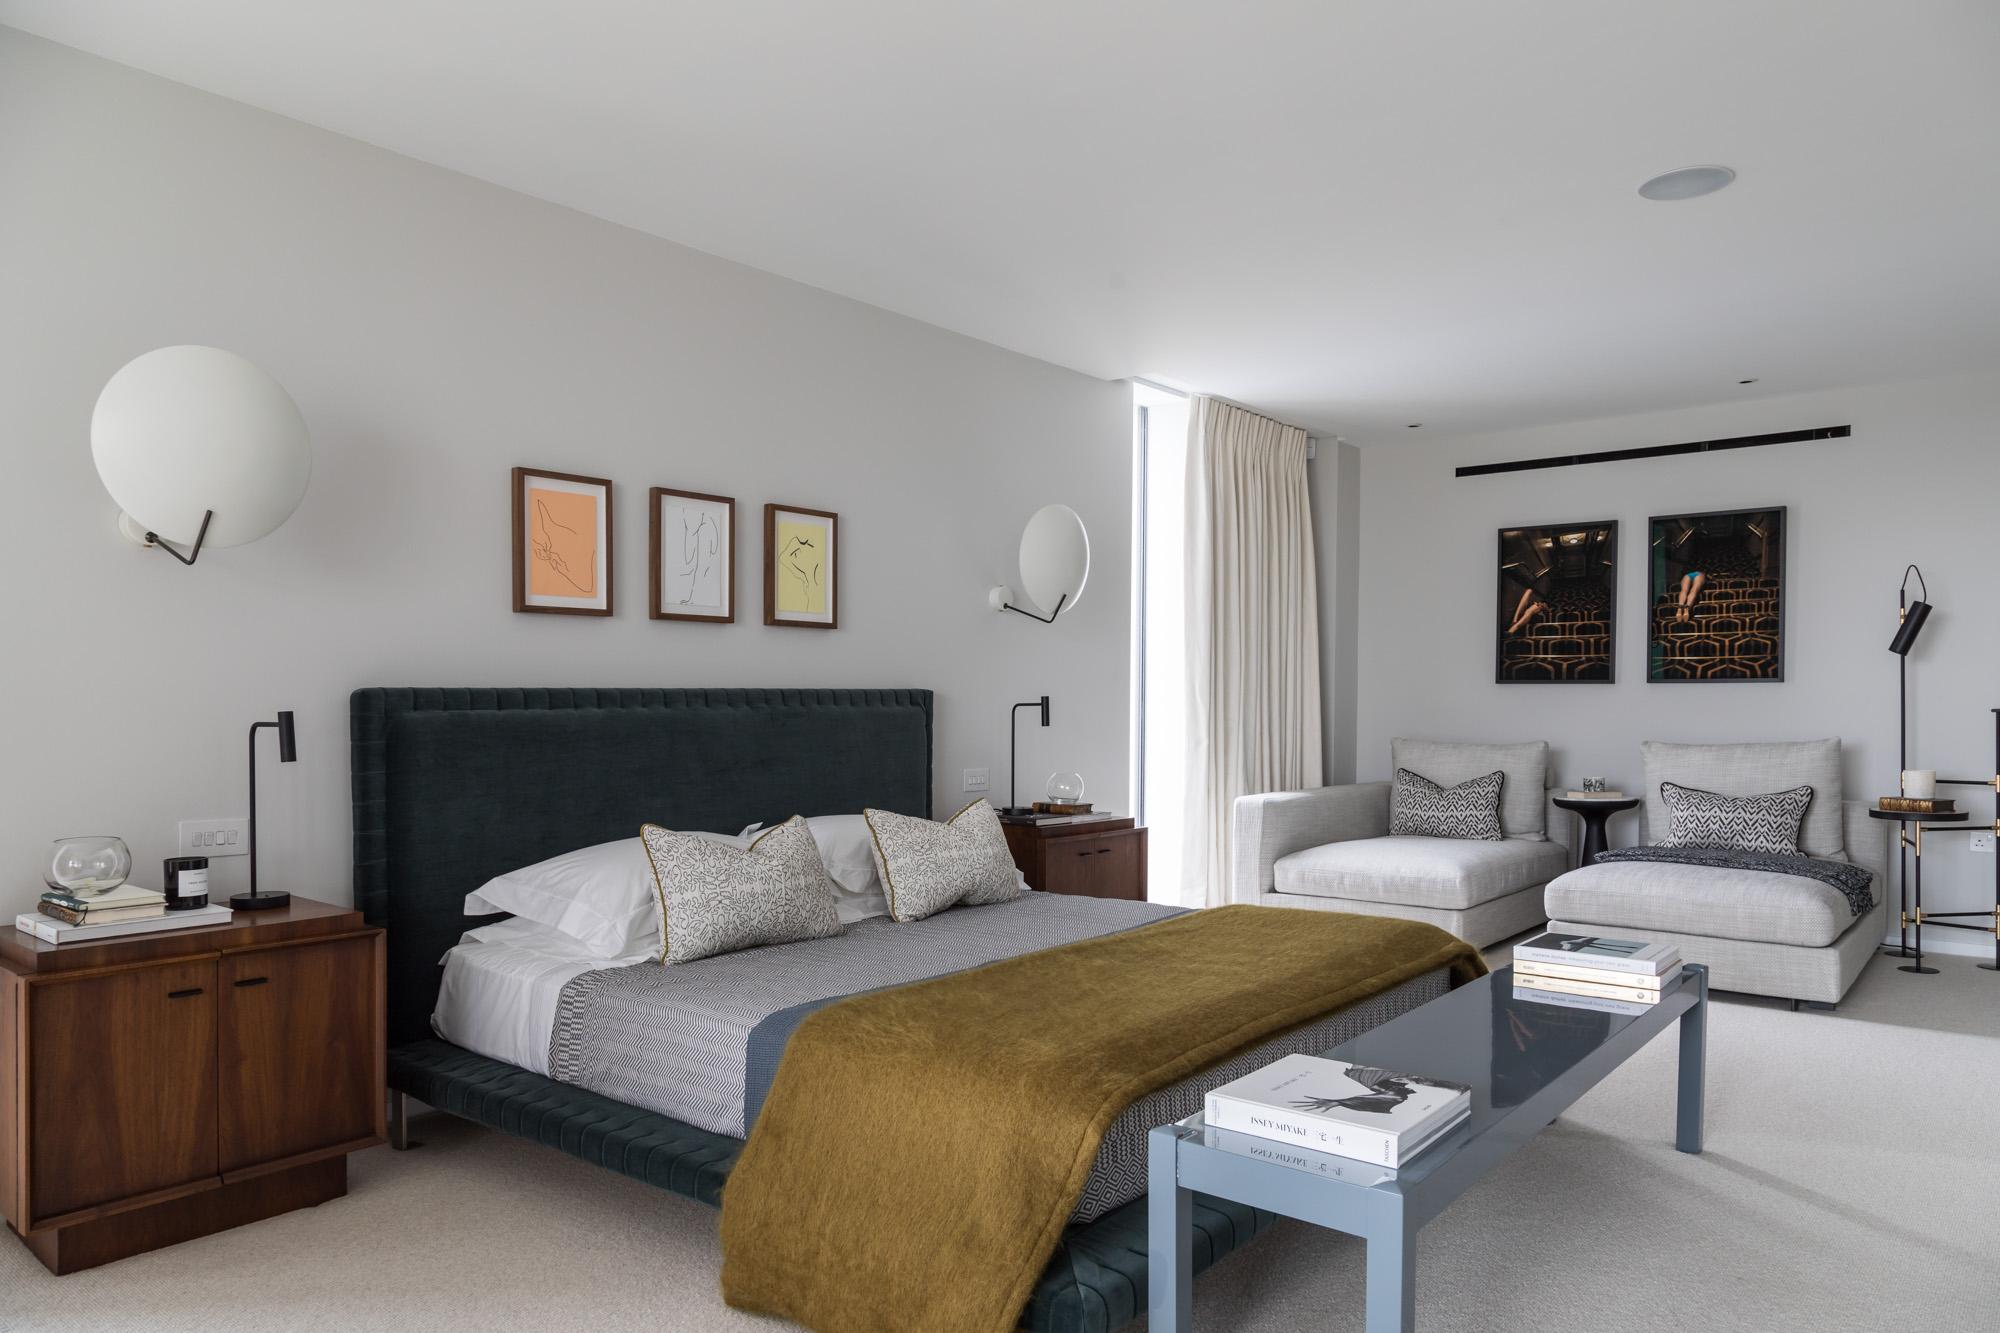 jonathan bond, interior photographer, master bedroom, battersea, london